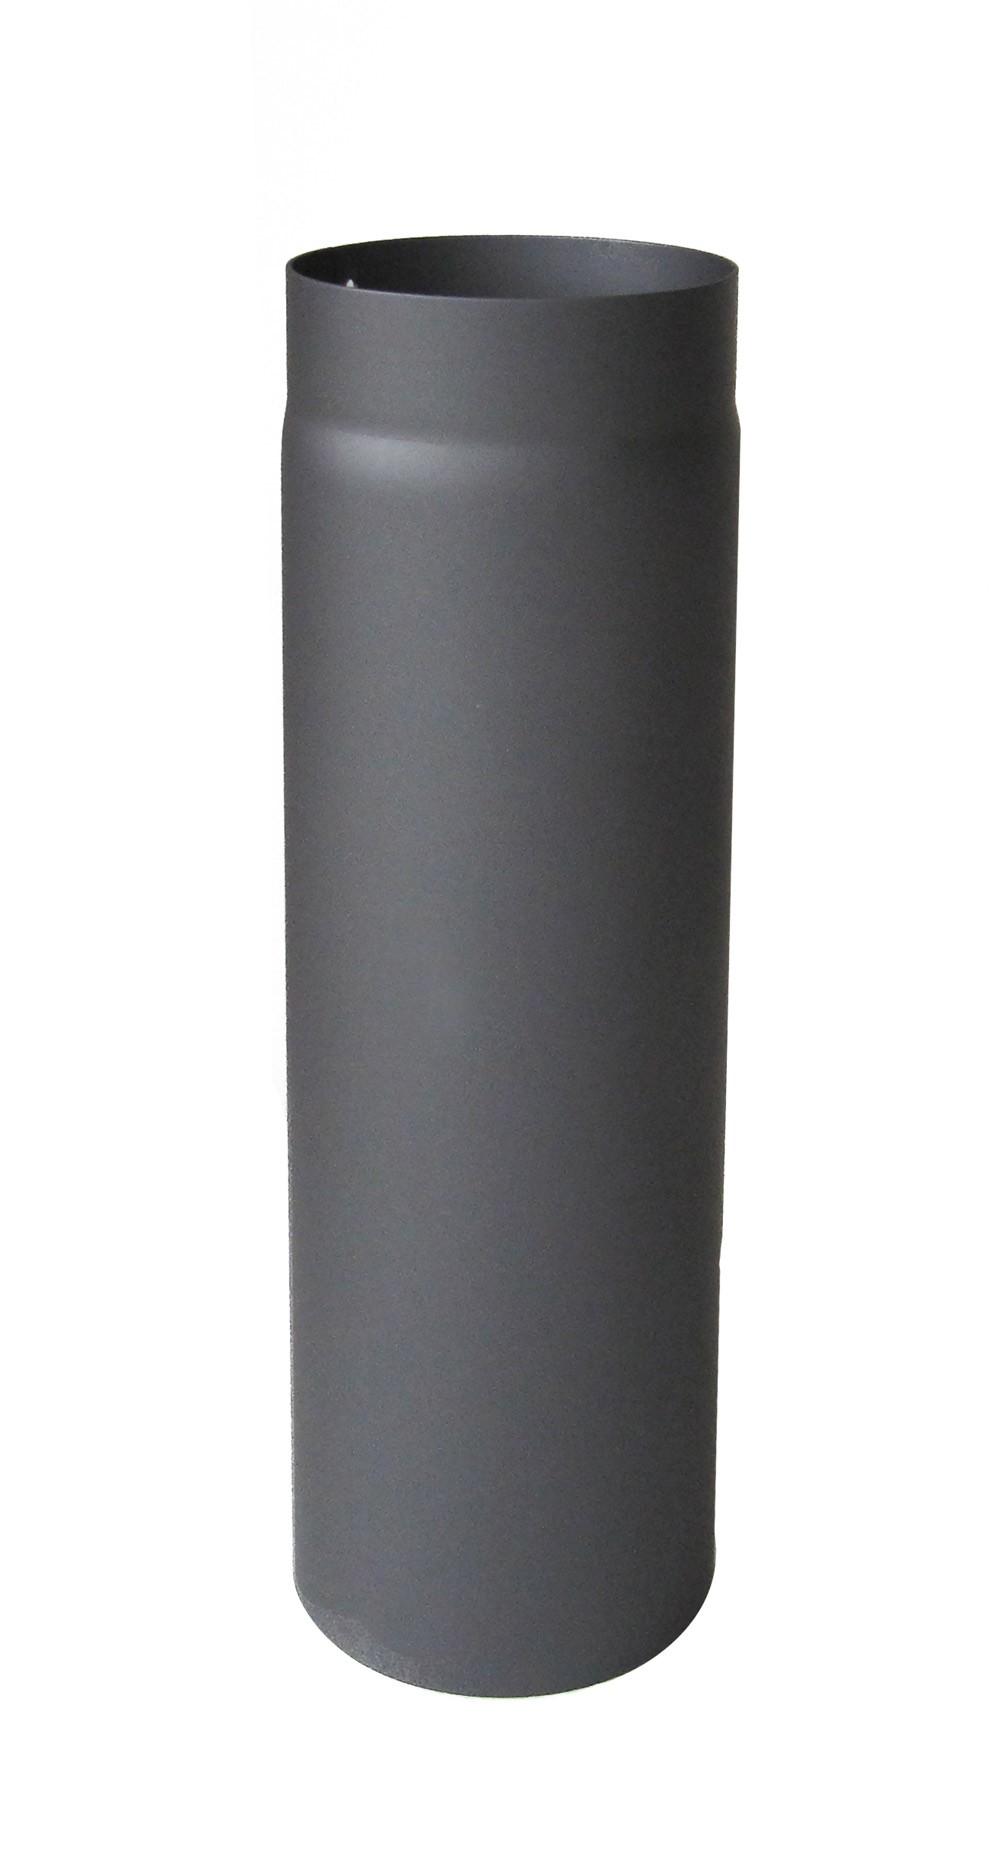 Ofenrohr / Rauchrohr Senotherm grau Ø120mm Länge 1000 mm Bild 2